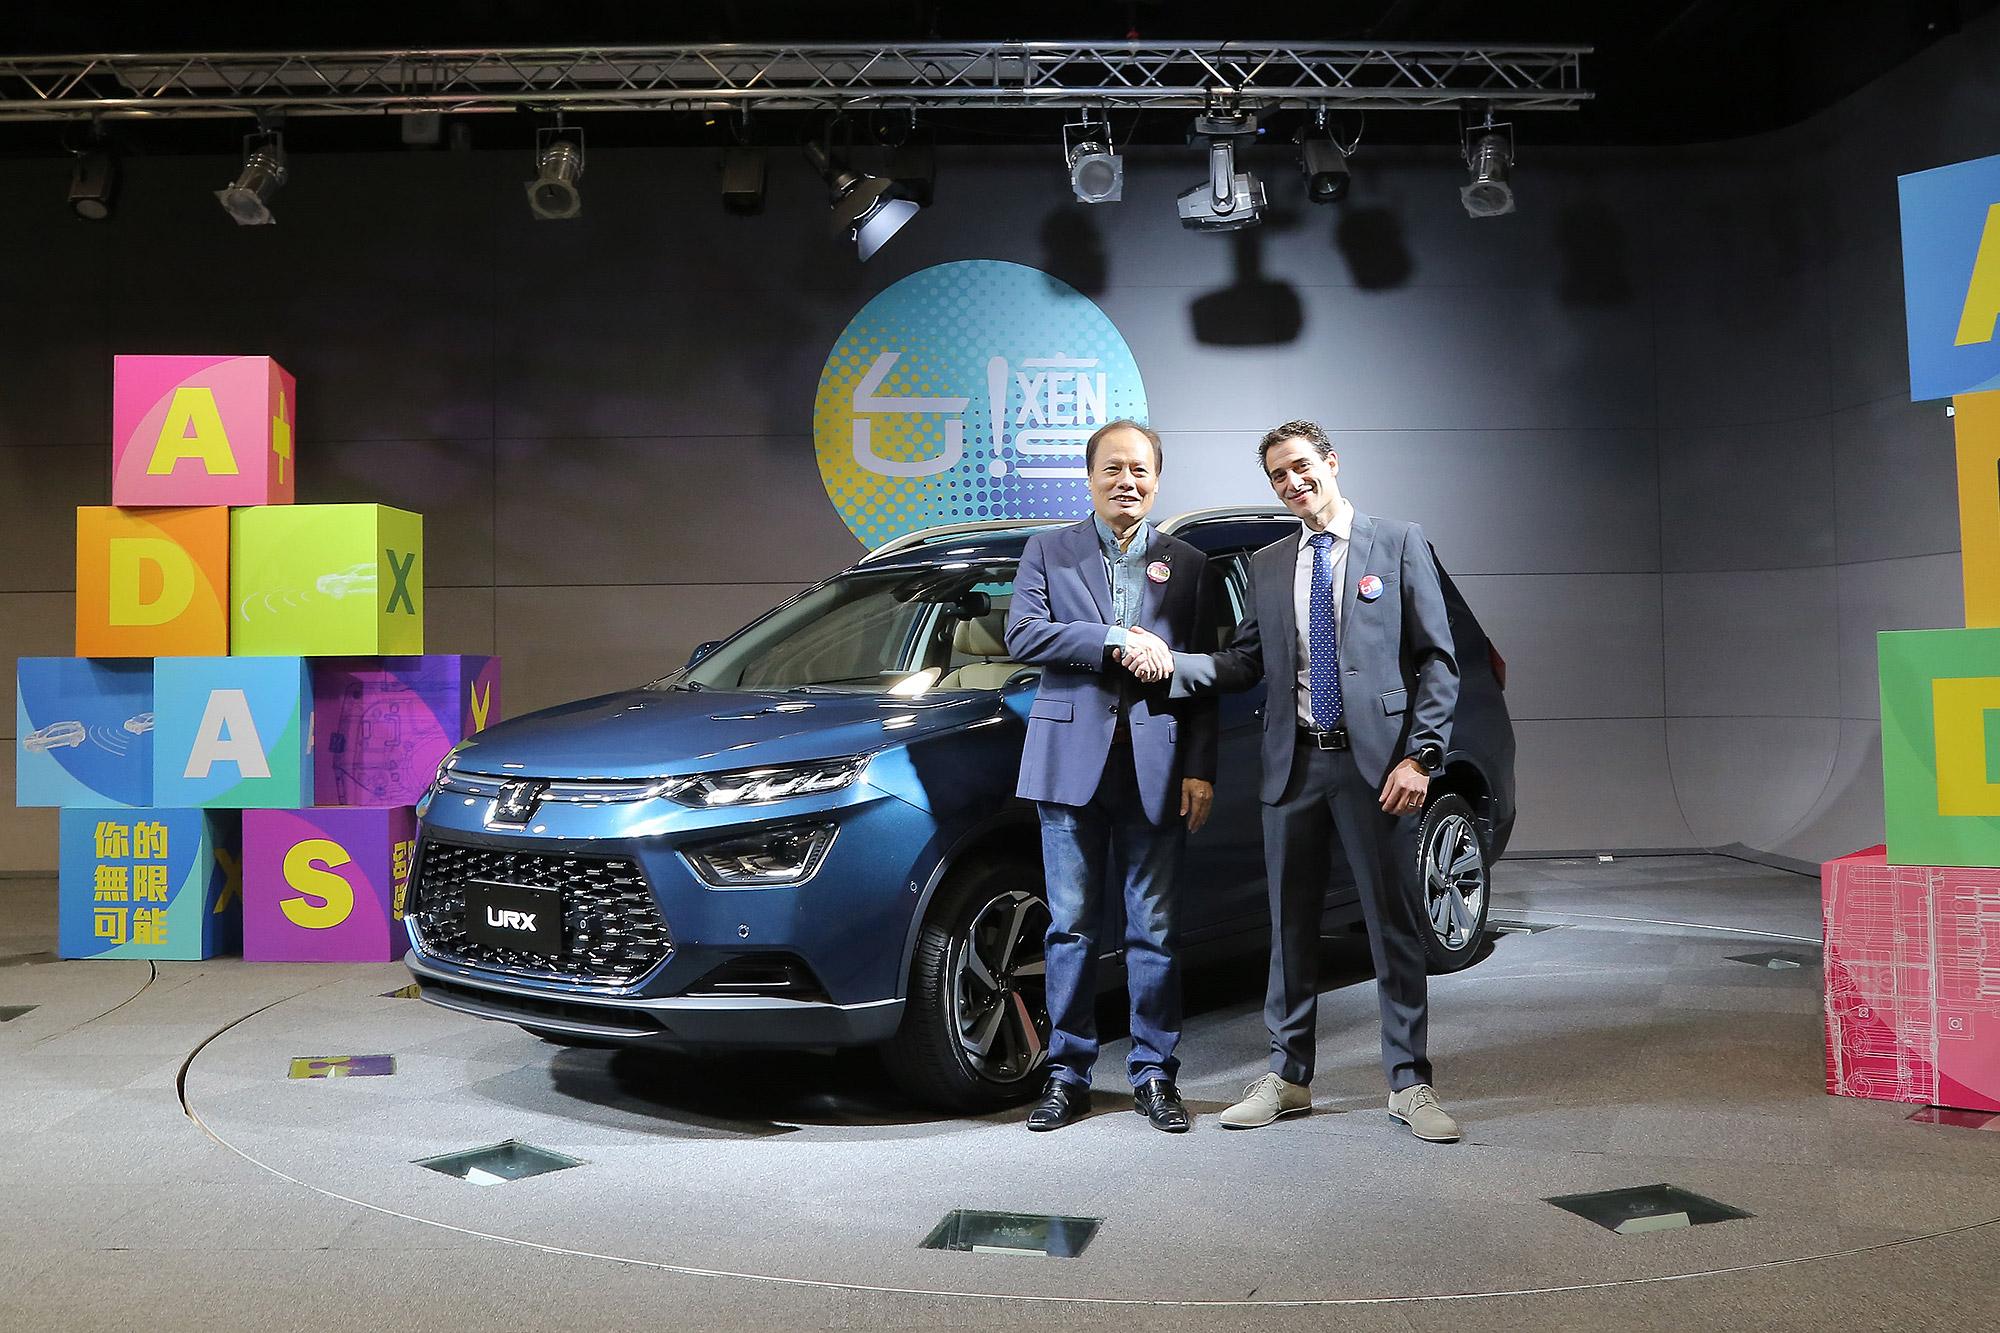 URX 的 ADAS 先進駕駛輔助系統認證,主要在 Euro NCAP 的認證機構西班牙 IDIADA 所進行。